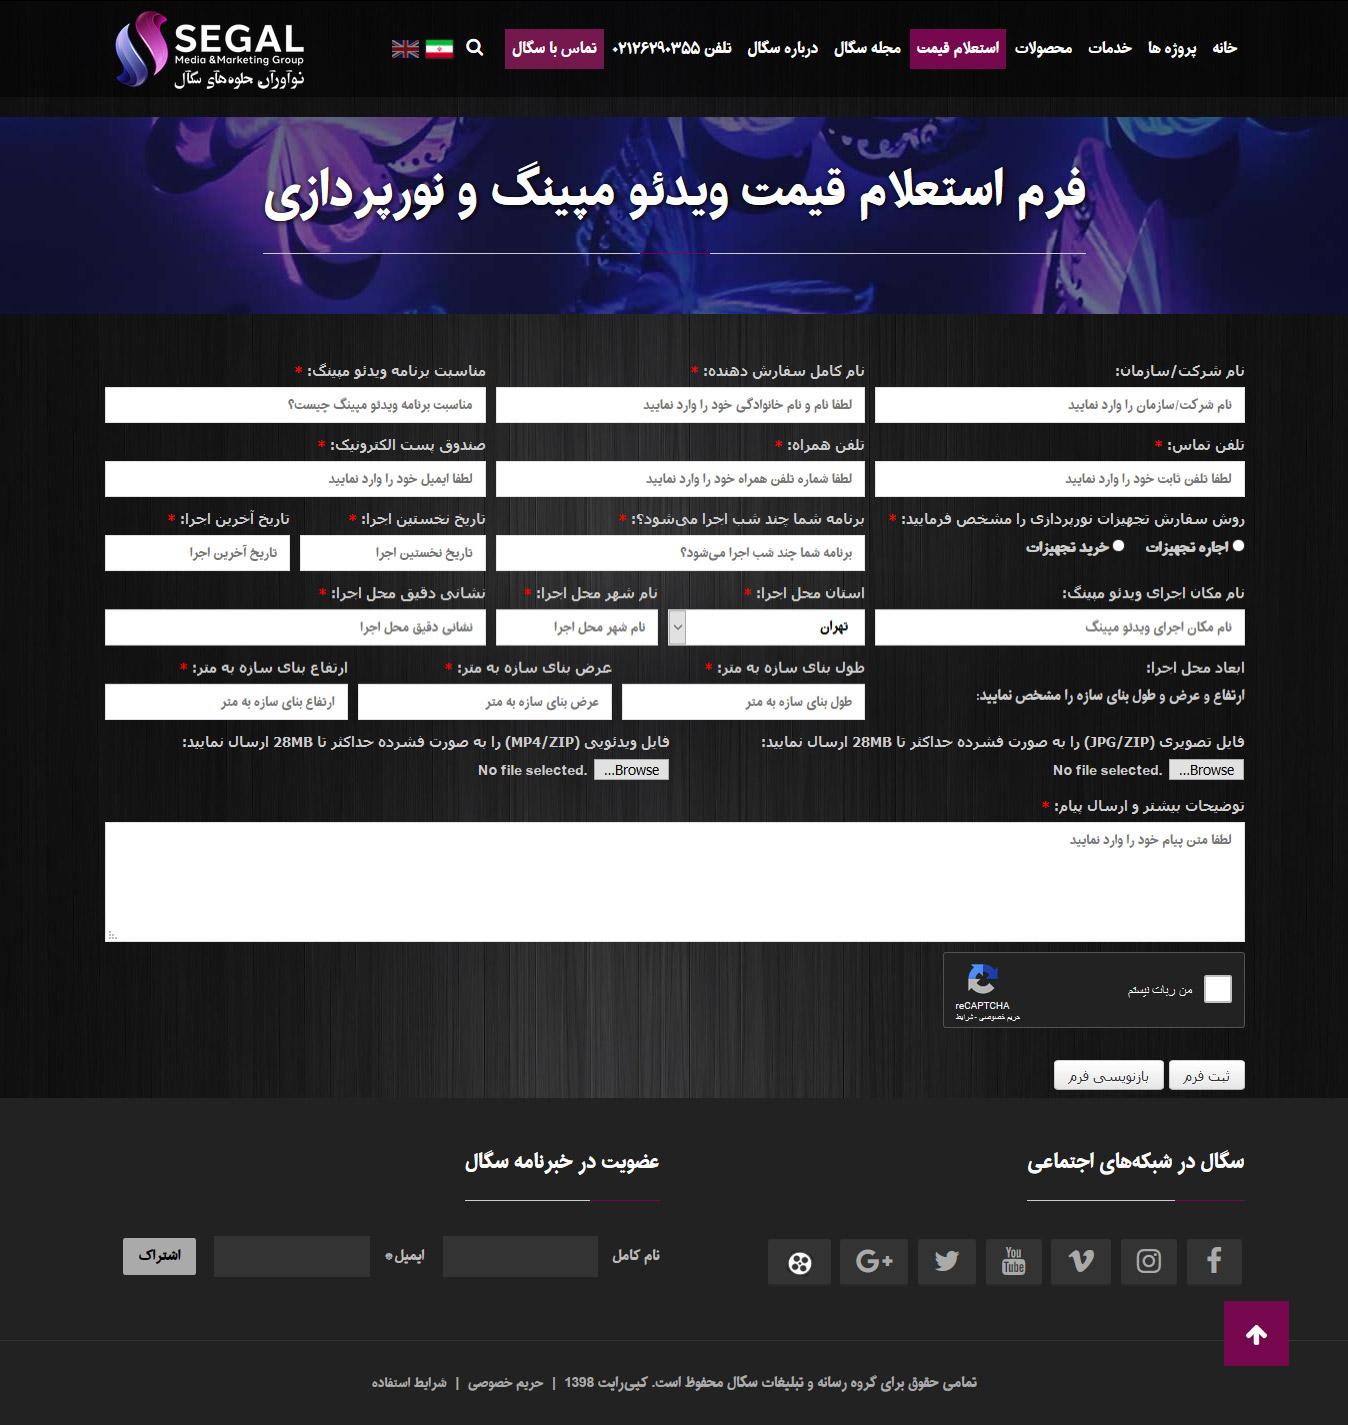 segalmedia-net-fa-Inquiry